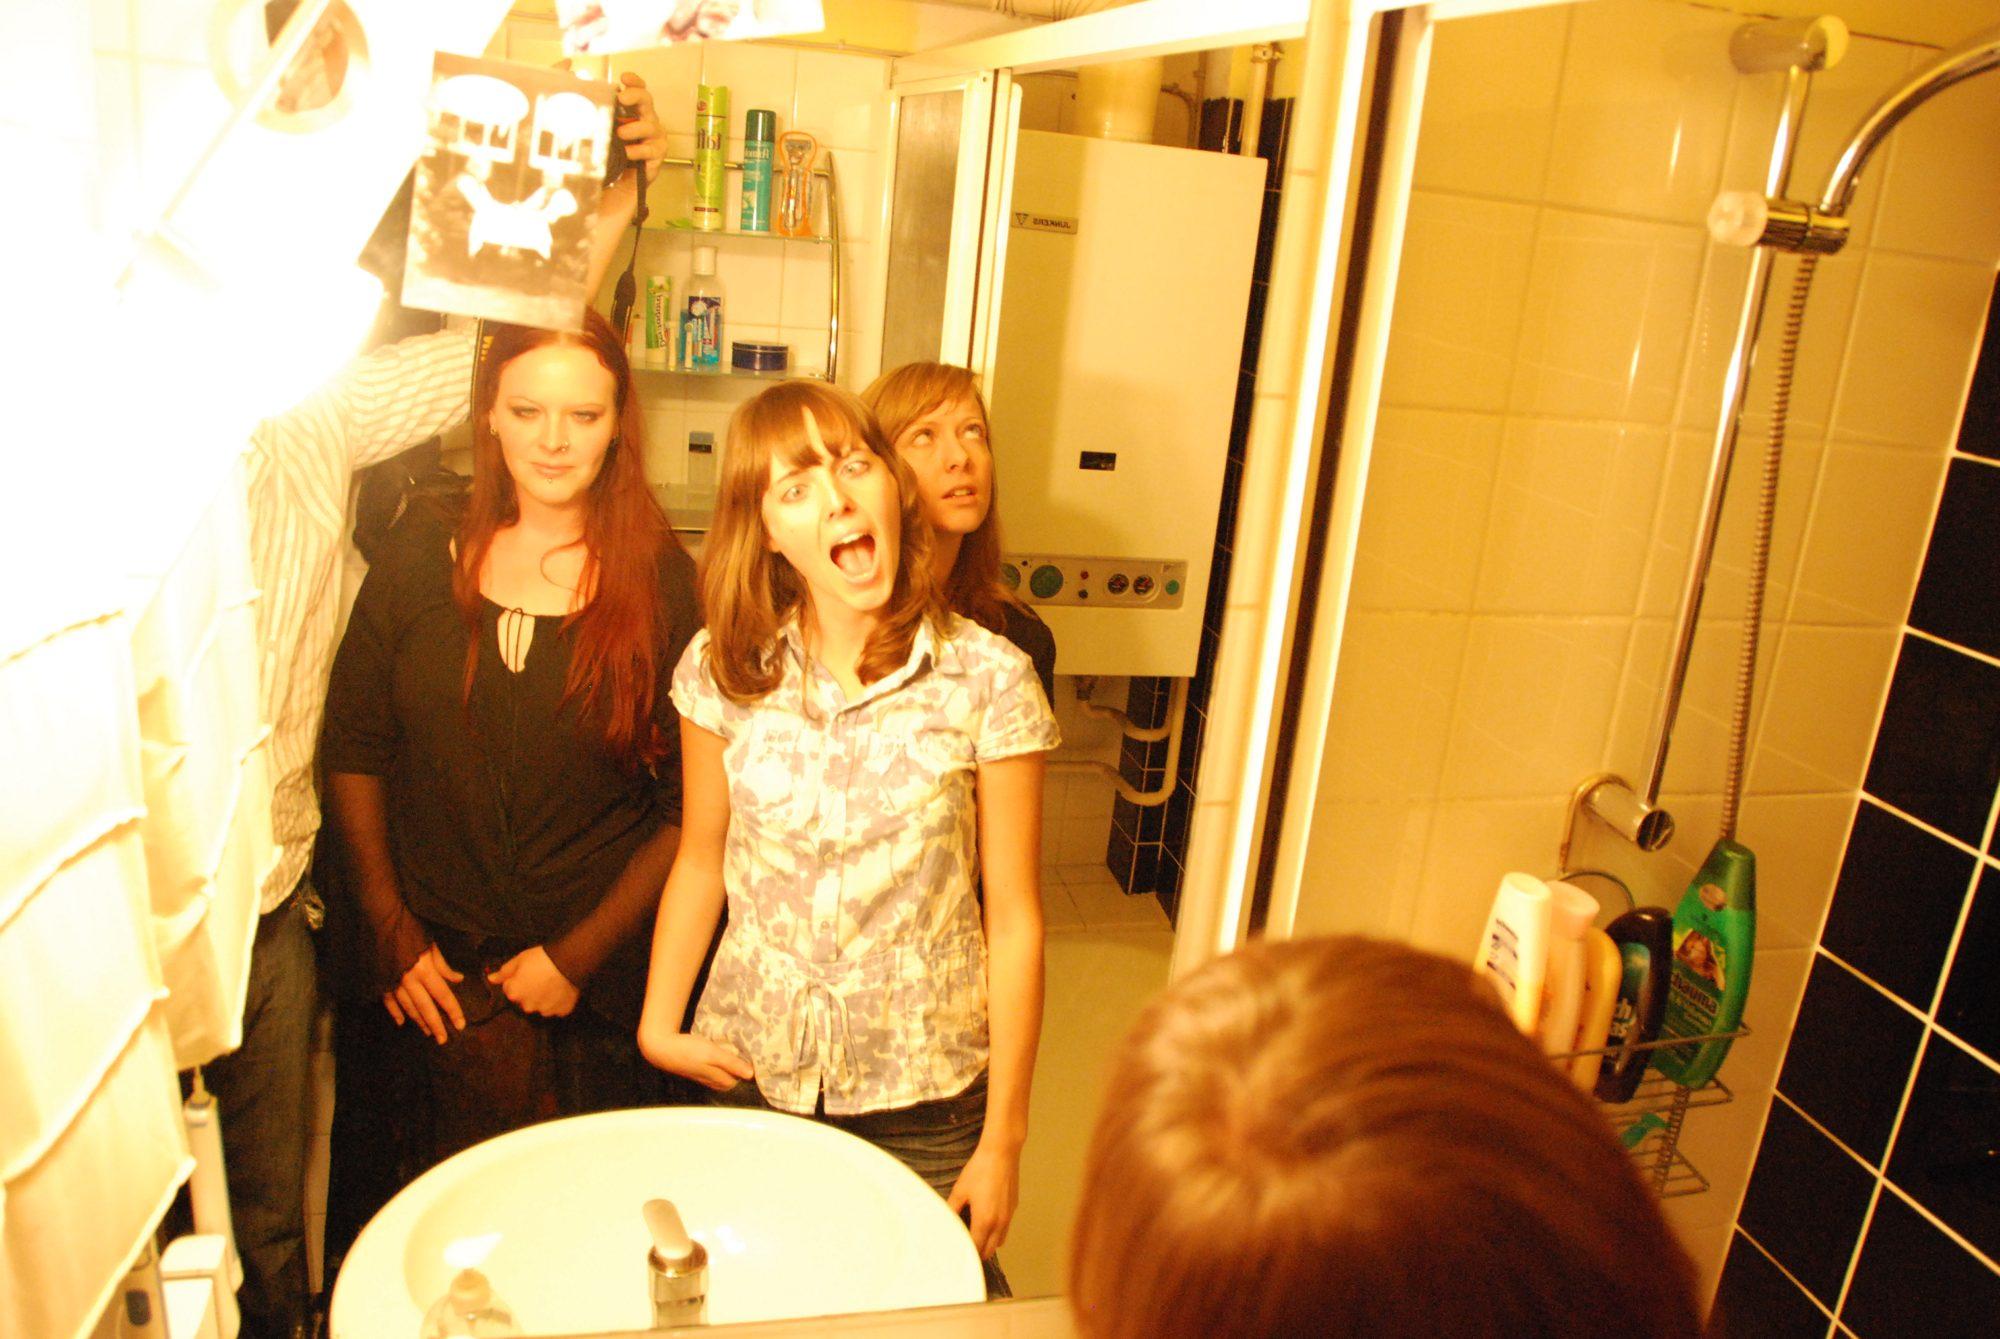 2008 - Houseparty